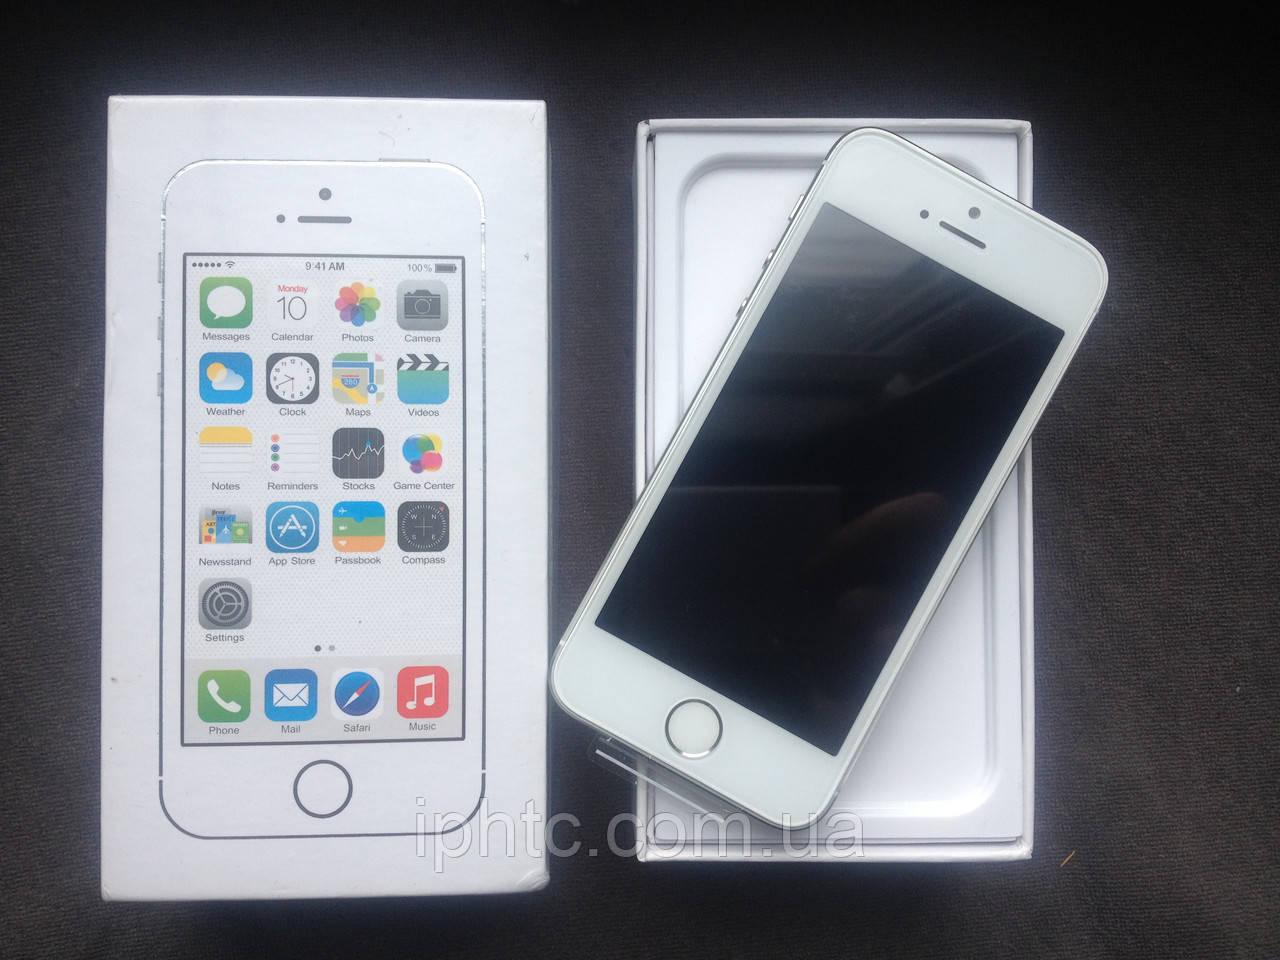 Apple iPhone 5S 16GB Silver /Новый /NeverLock/ Запечатан